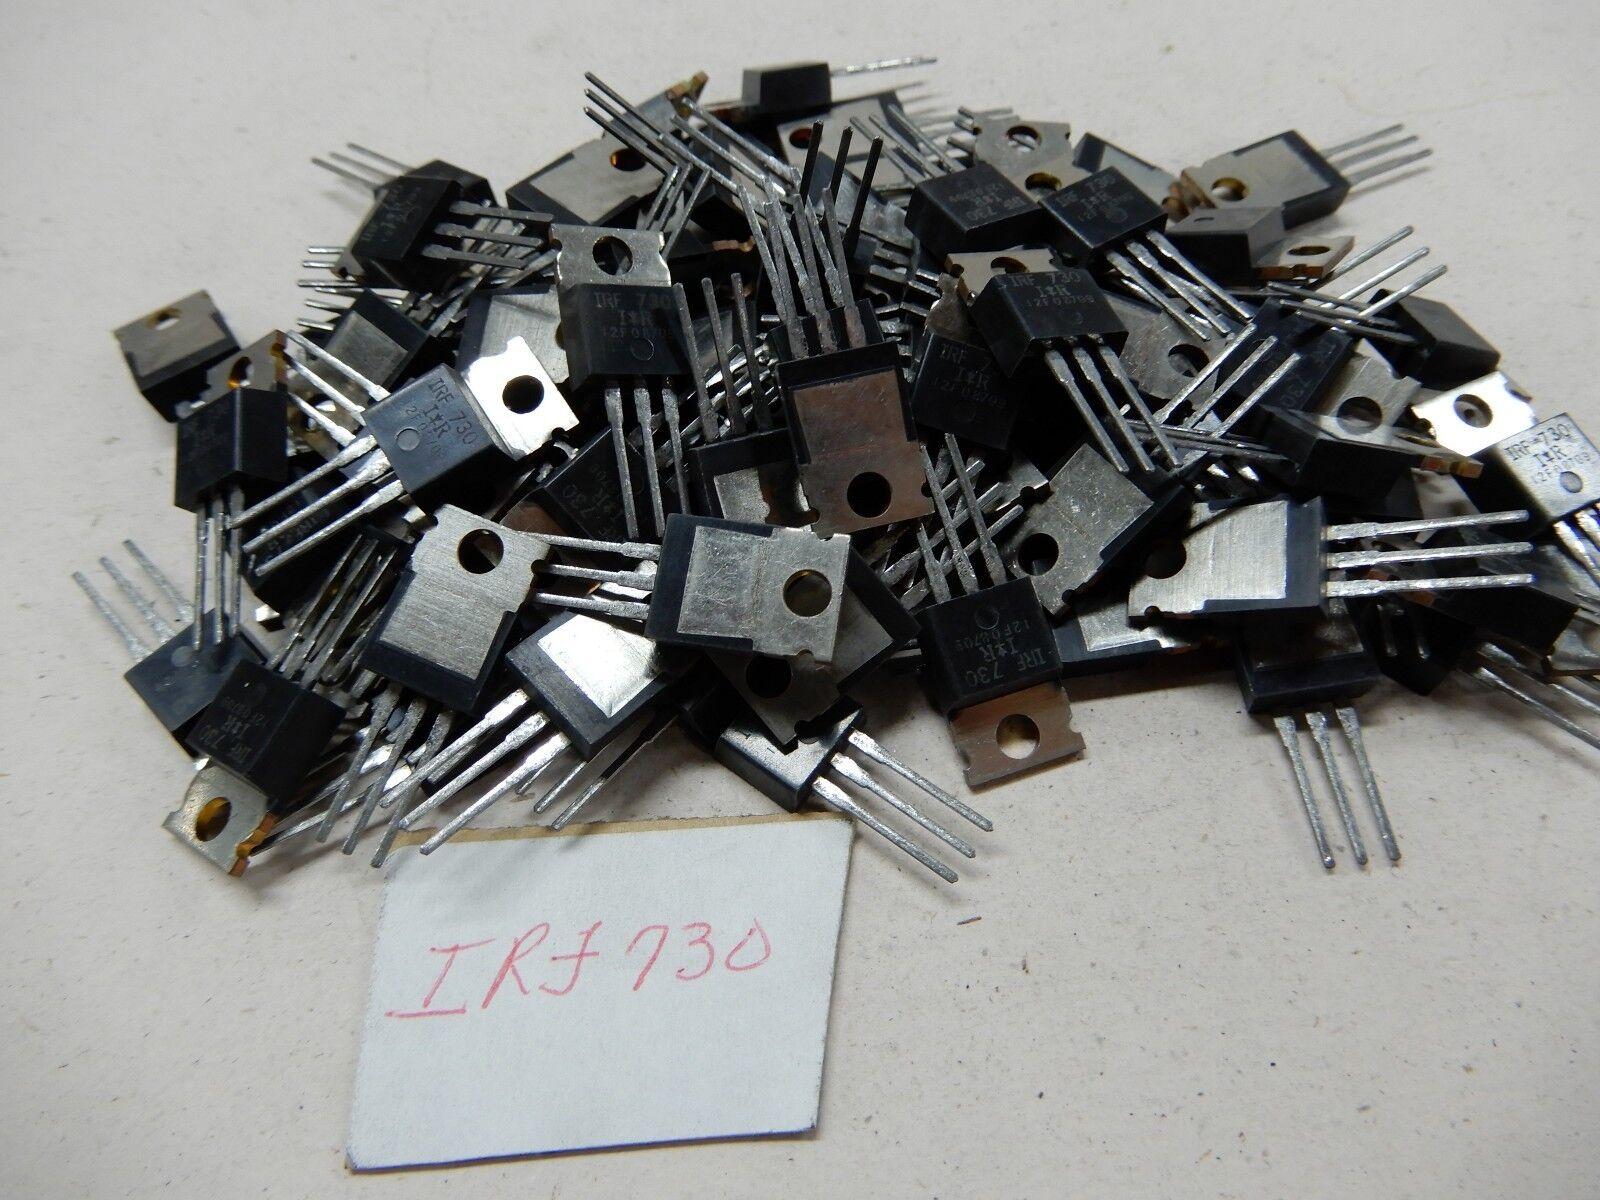 International Rectifier IRF730 Lot of 50? Transistors NOS BGX